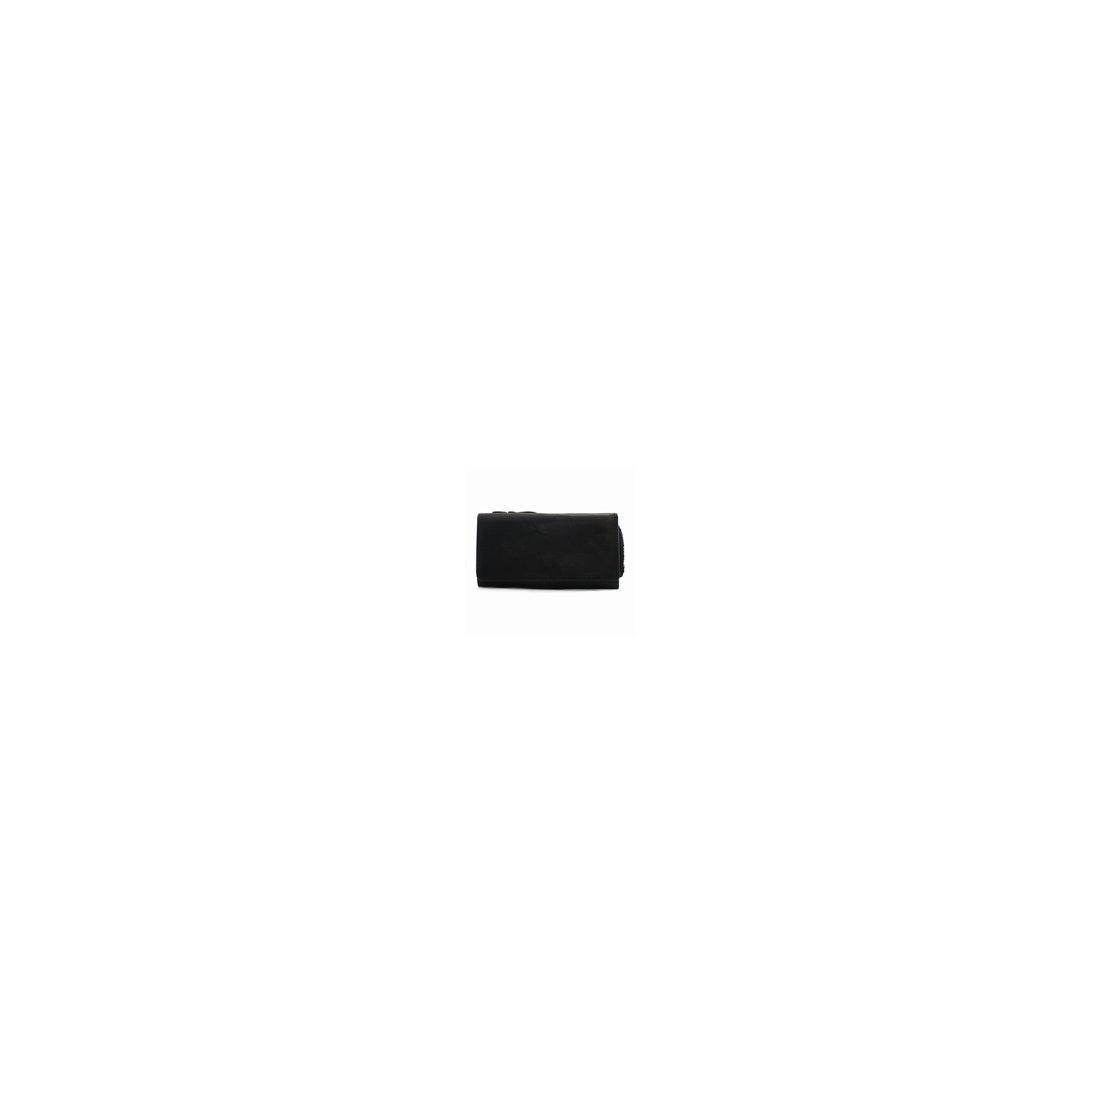 【SAC'S BAR】SOLATINA ソラチナ キーケース 38154 焦げ加工ホースレザー キーケース 全4色 BLACK メンズ